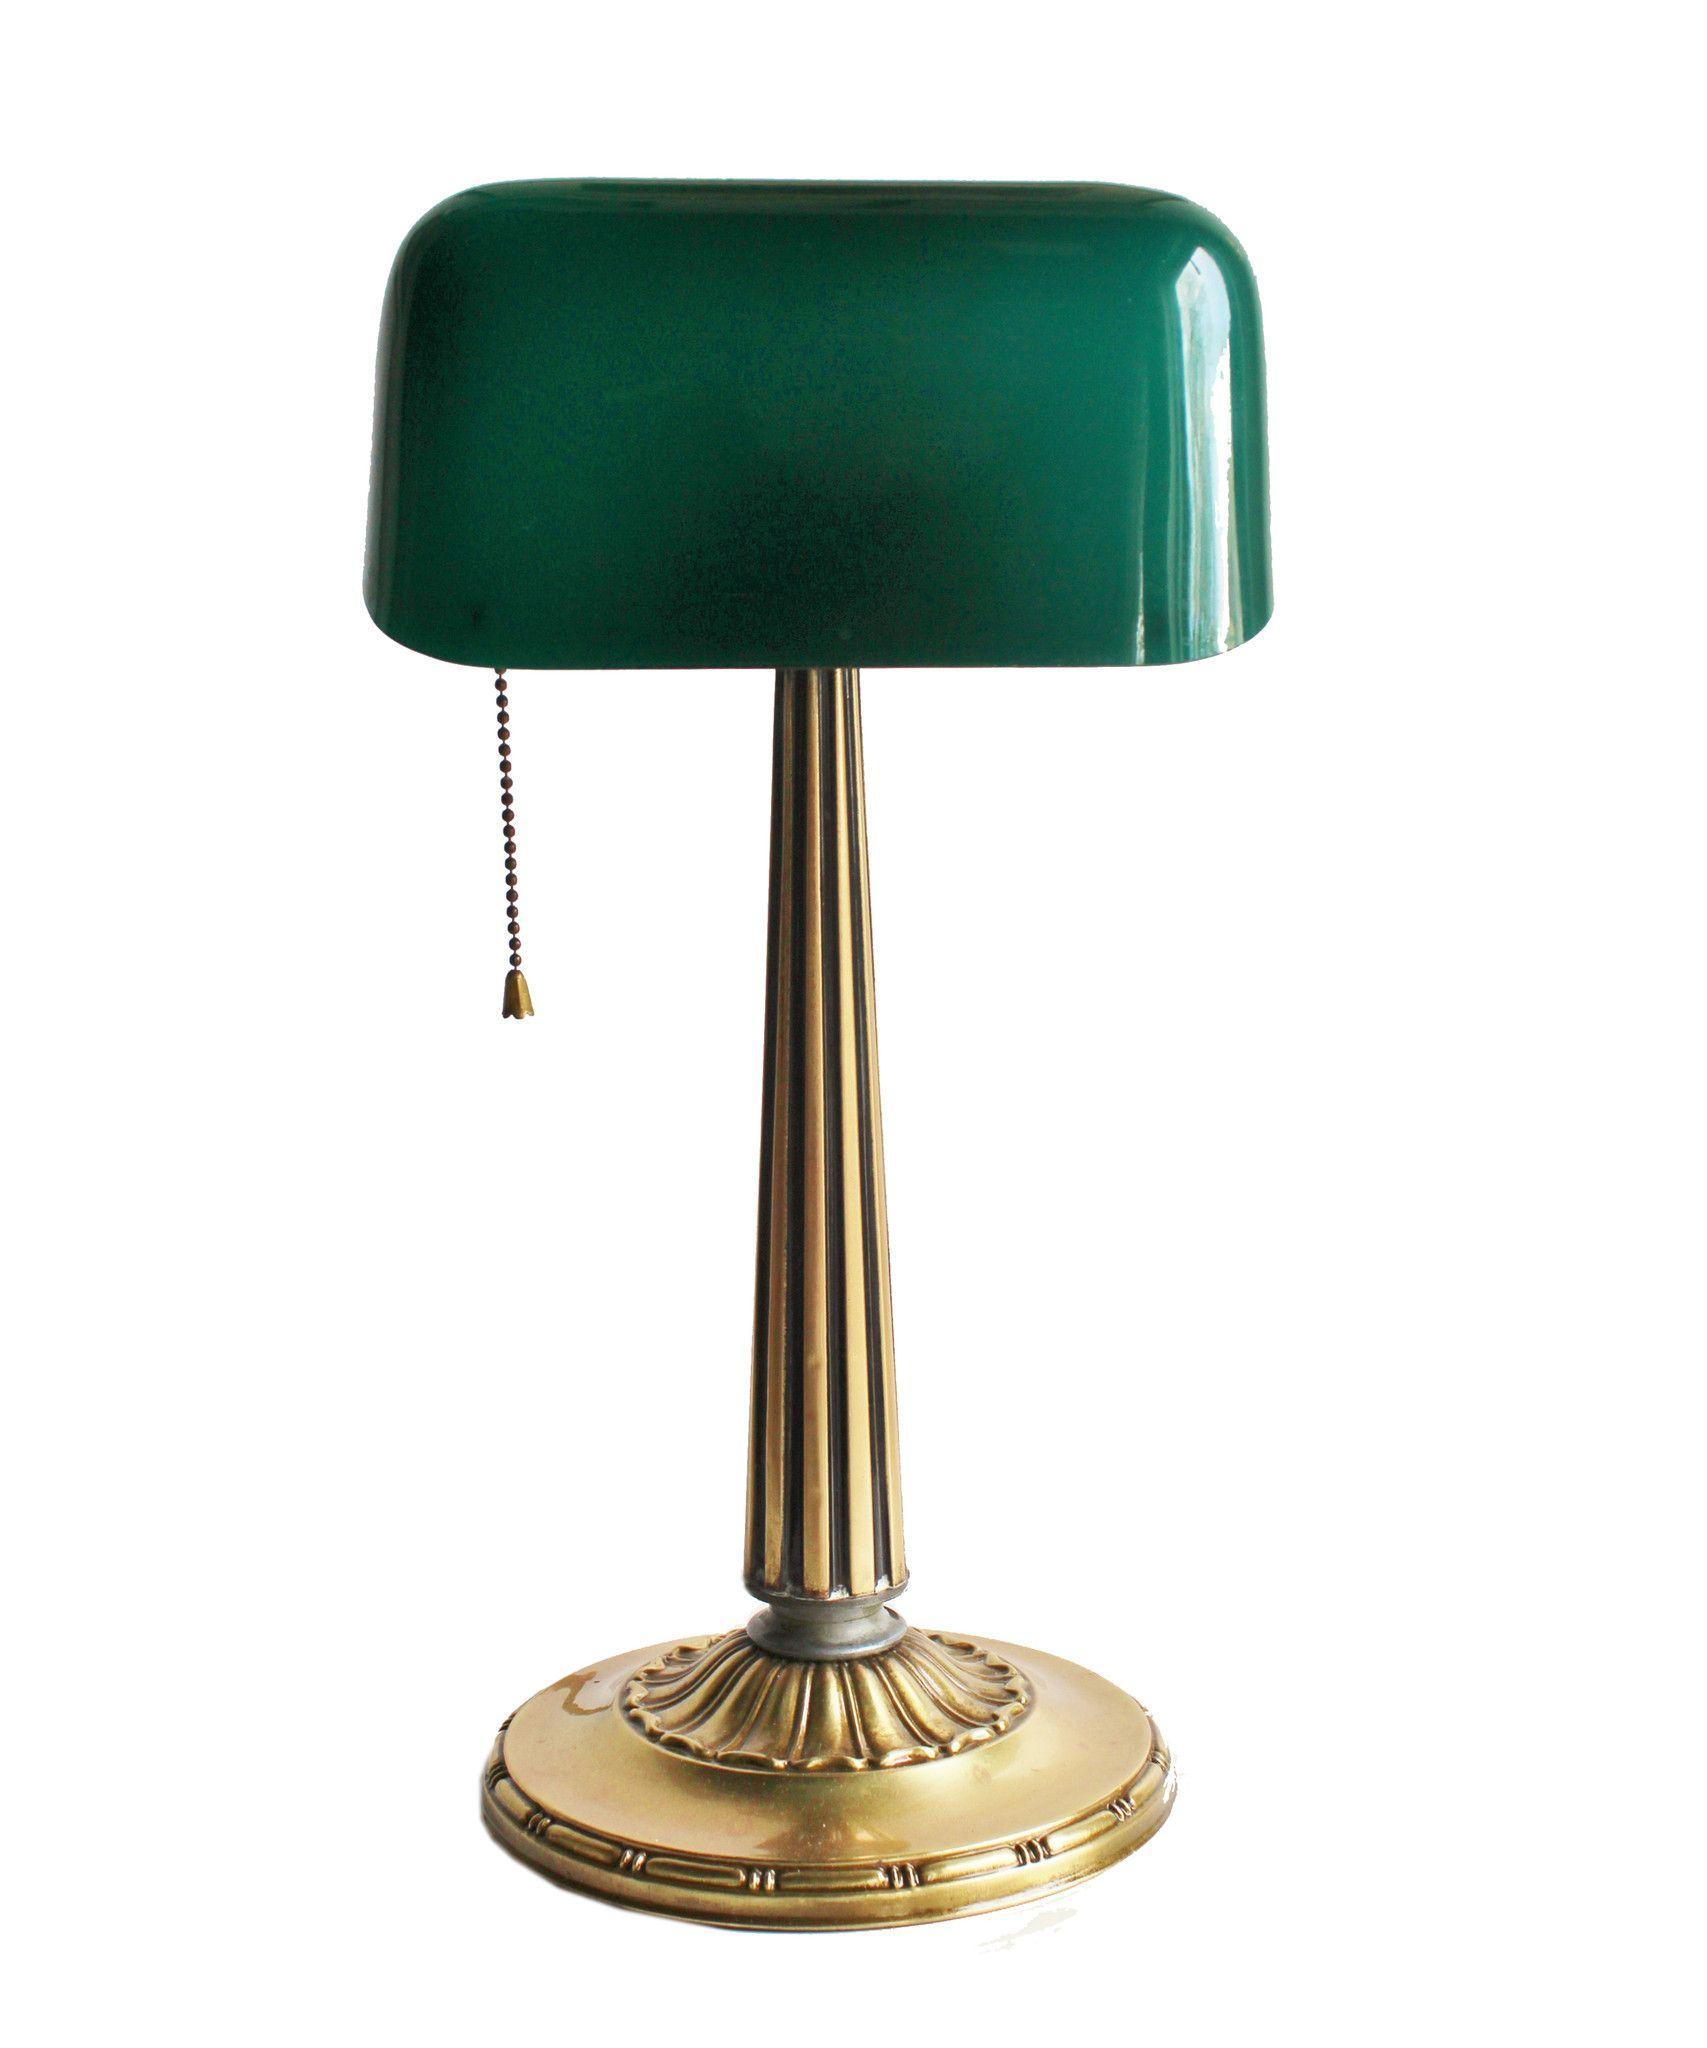 1916 Antique Emeralite Brass Task Lamp - solid brass base ...